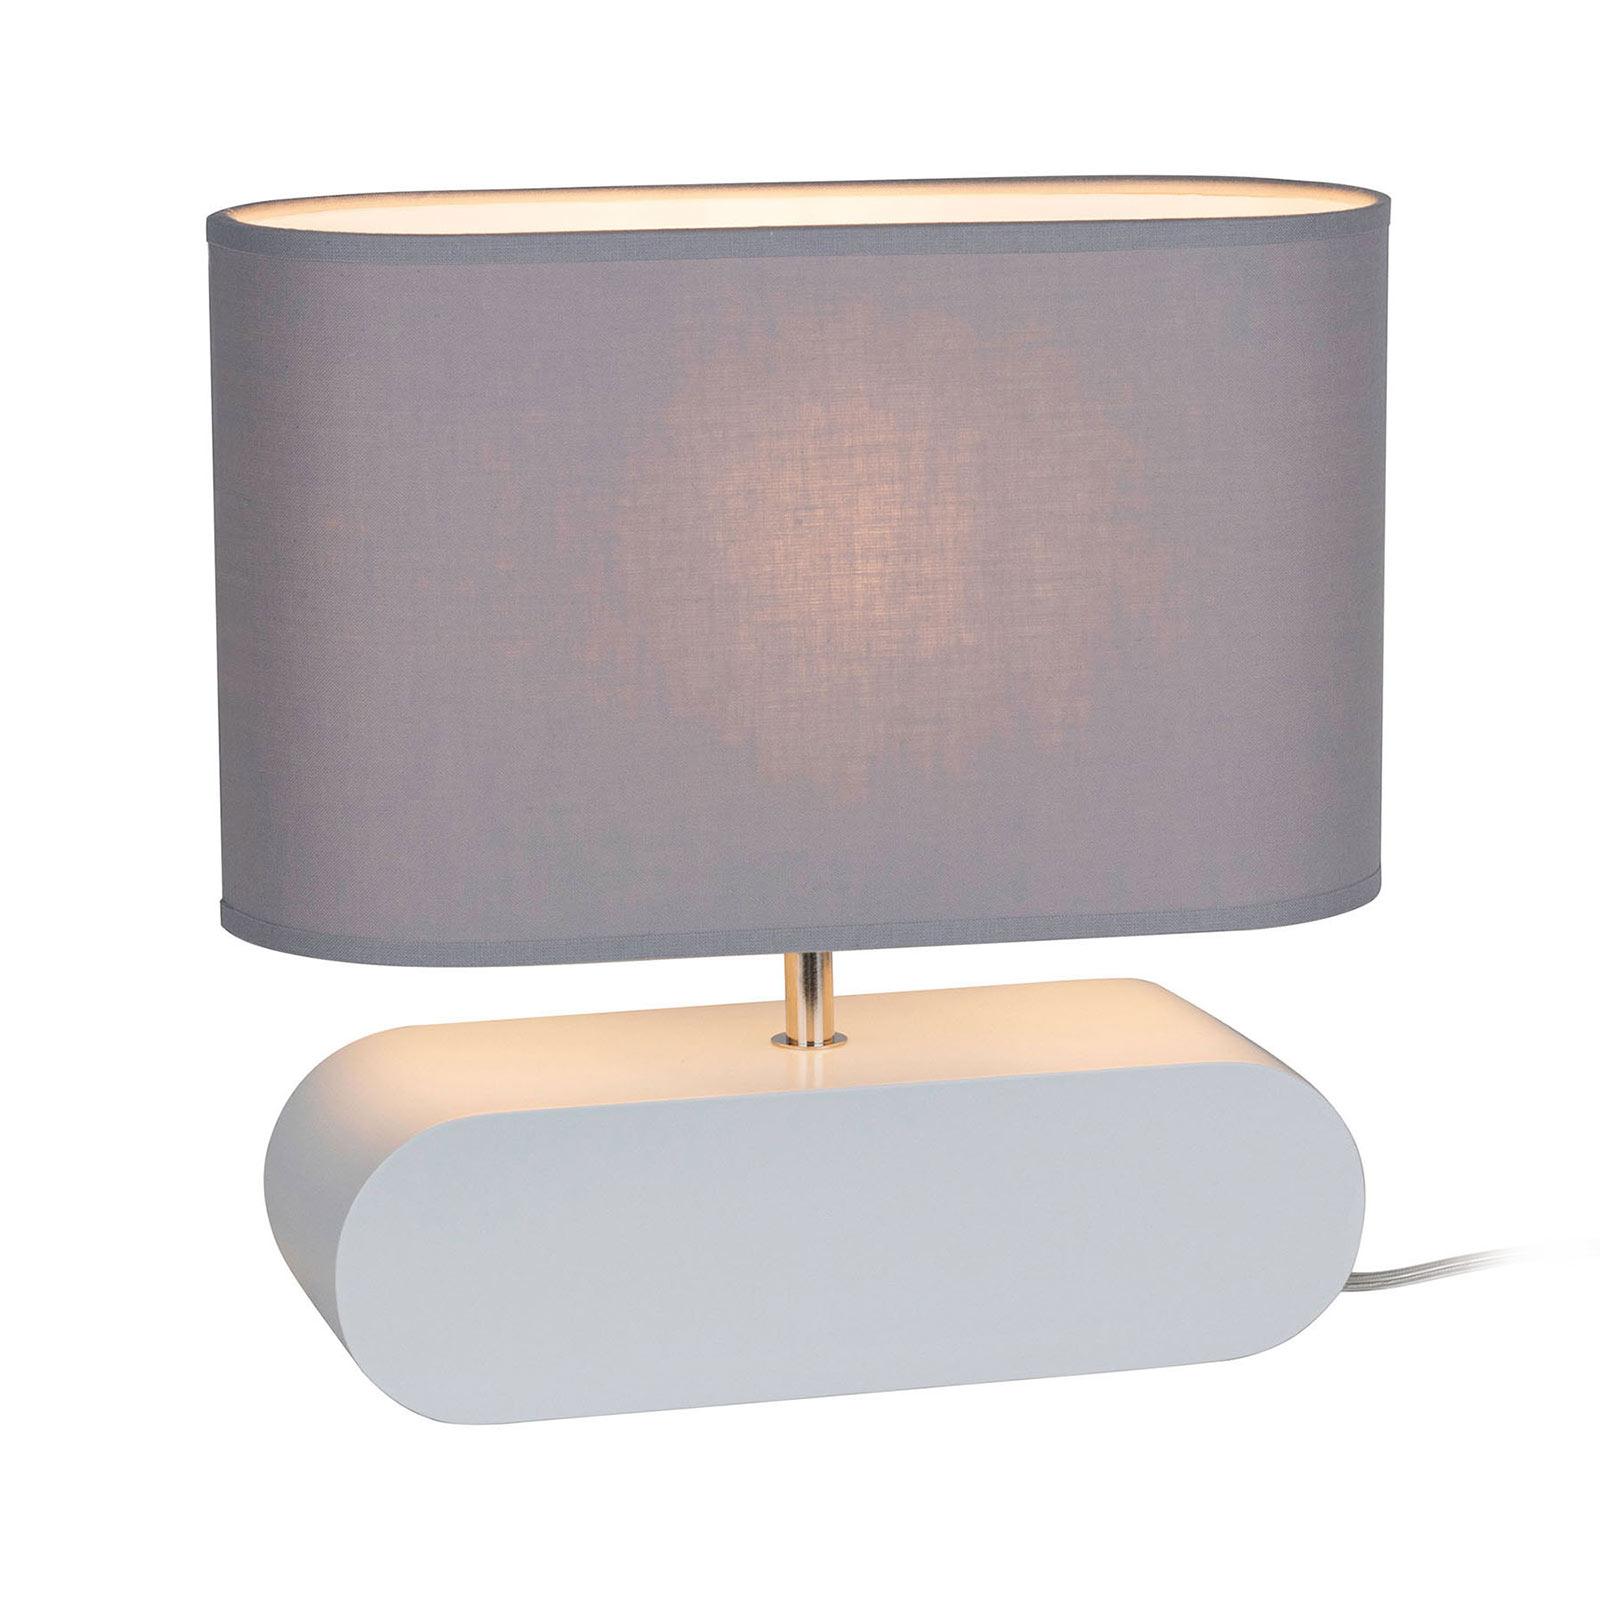 Lampada da tavolo Cassy base bianca, stoffa grigia